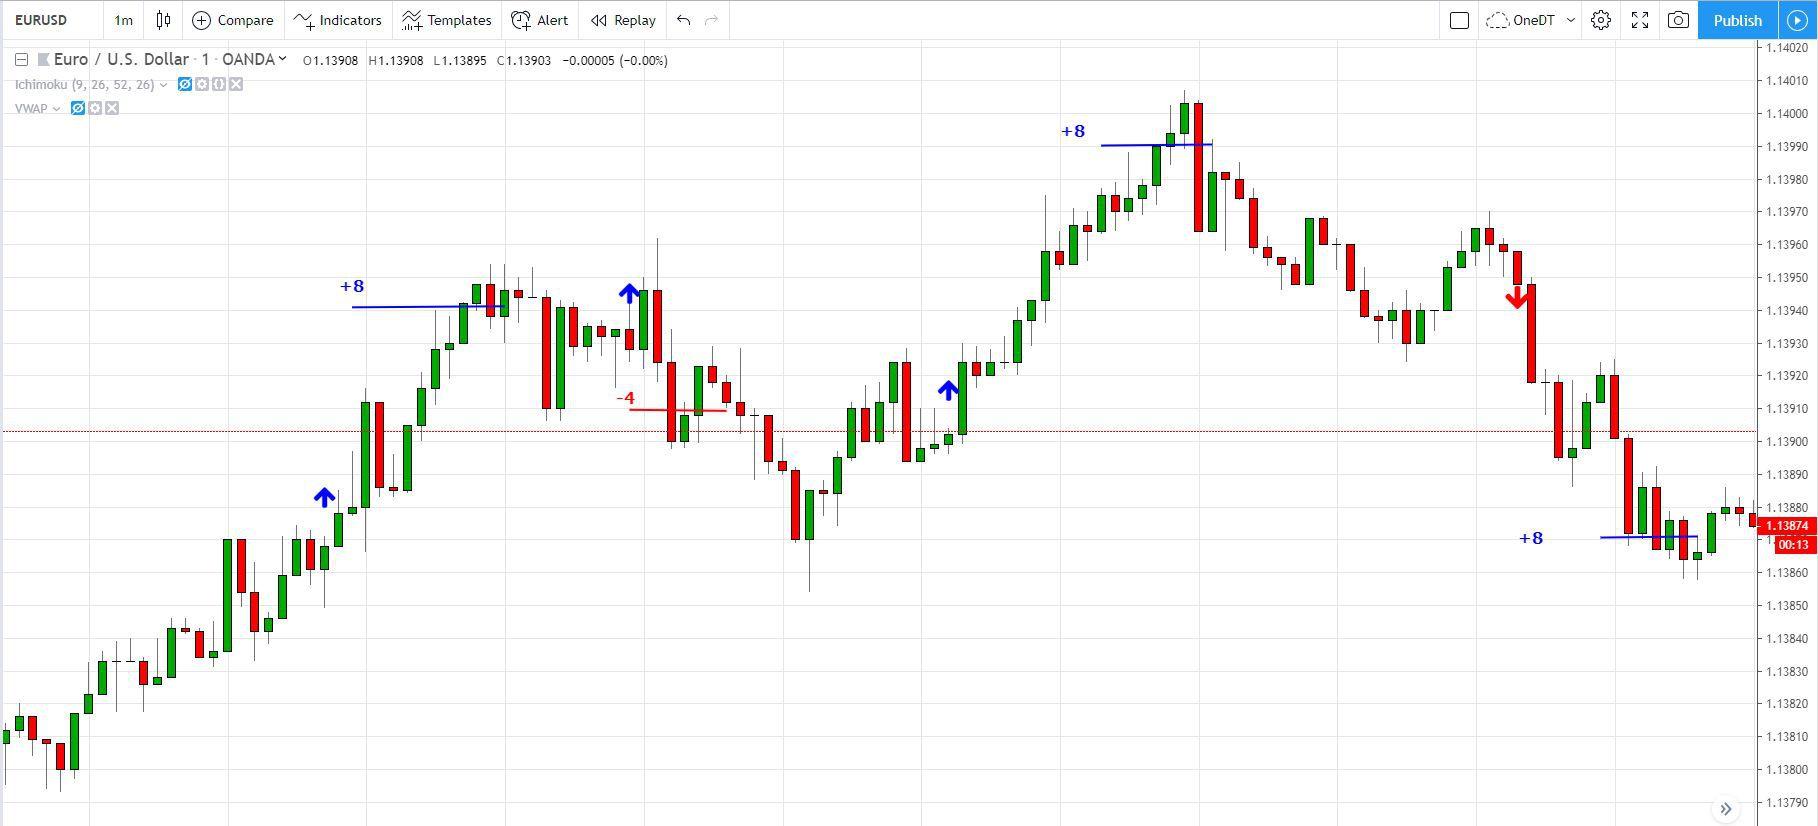 loose monetary policy investopedia forex